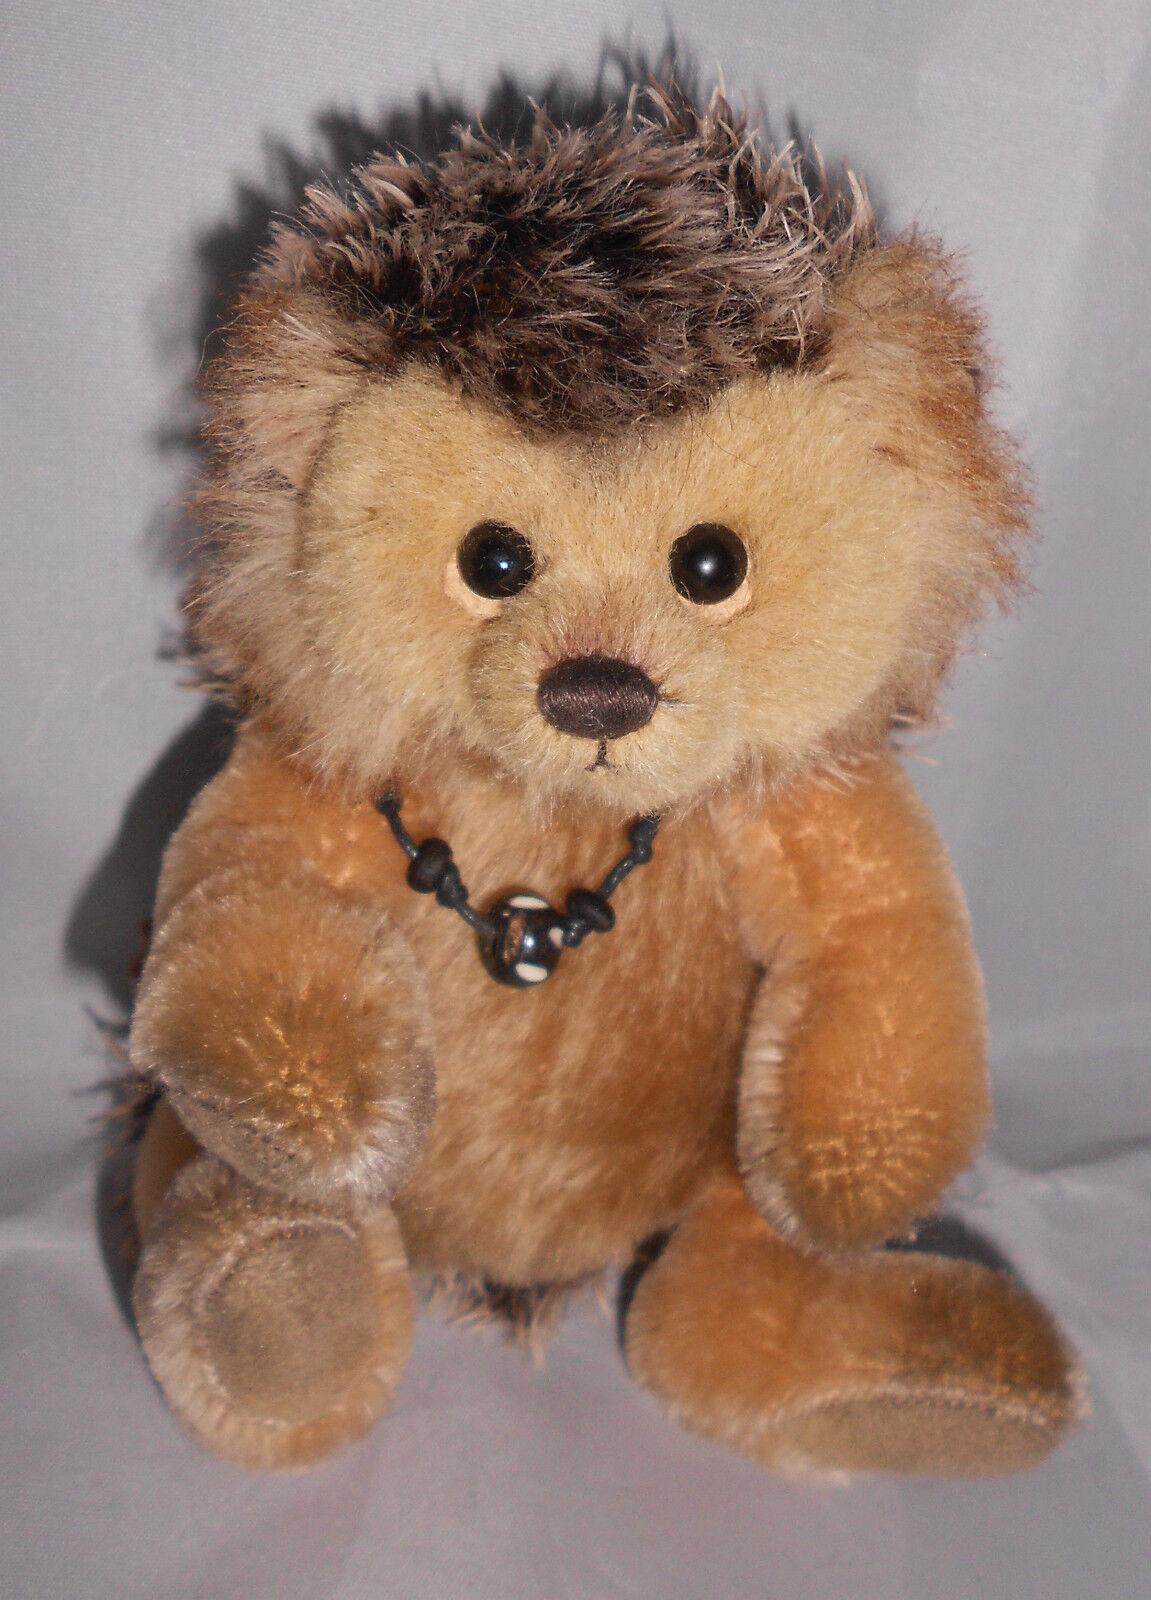 Charlie Bears HOGLET Hedgehog Minimo Isabelle Lee Mohair Alpaca Limited Edition